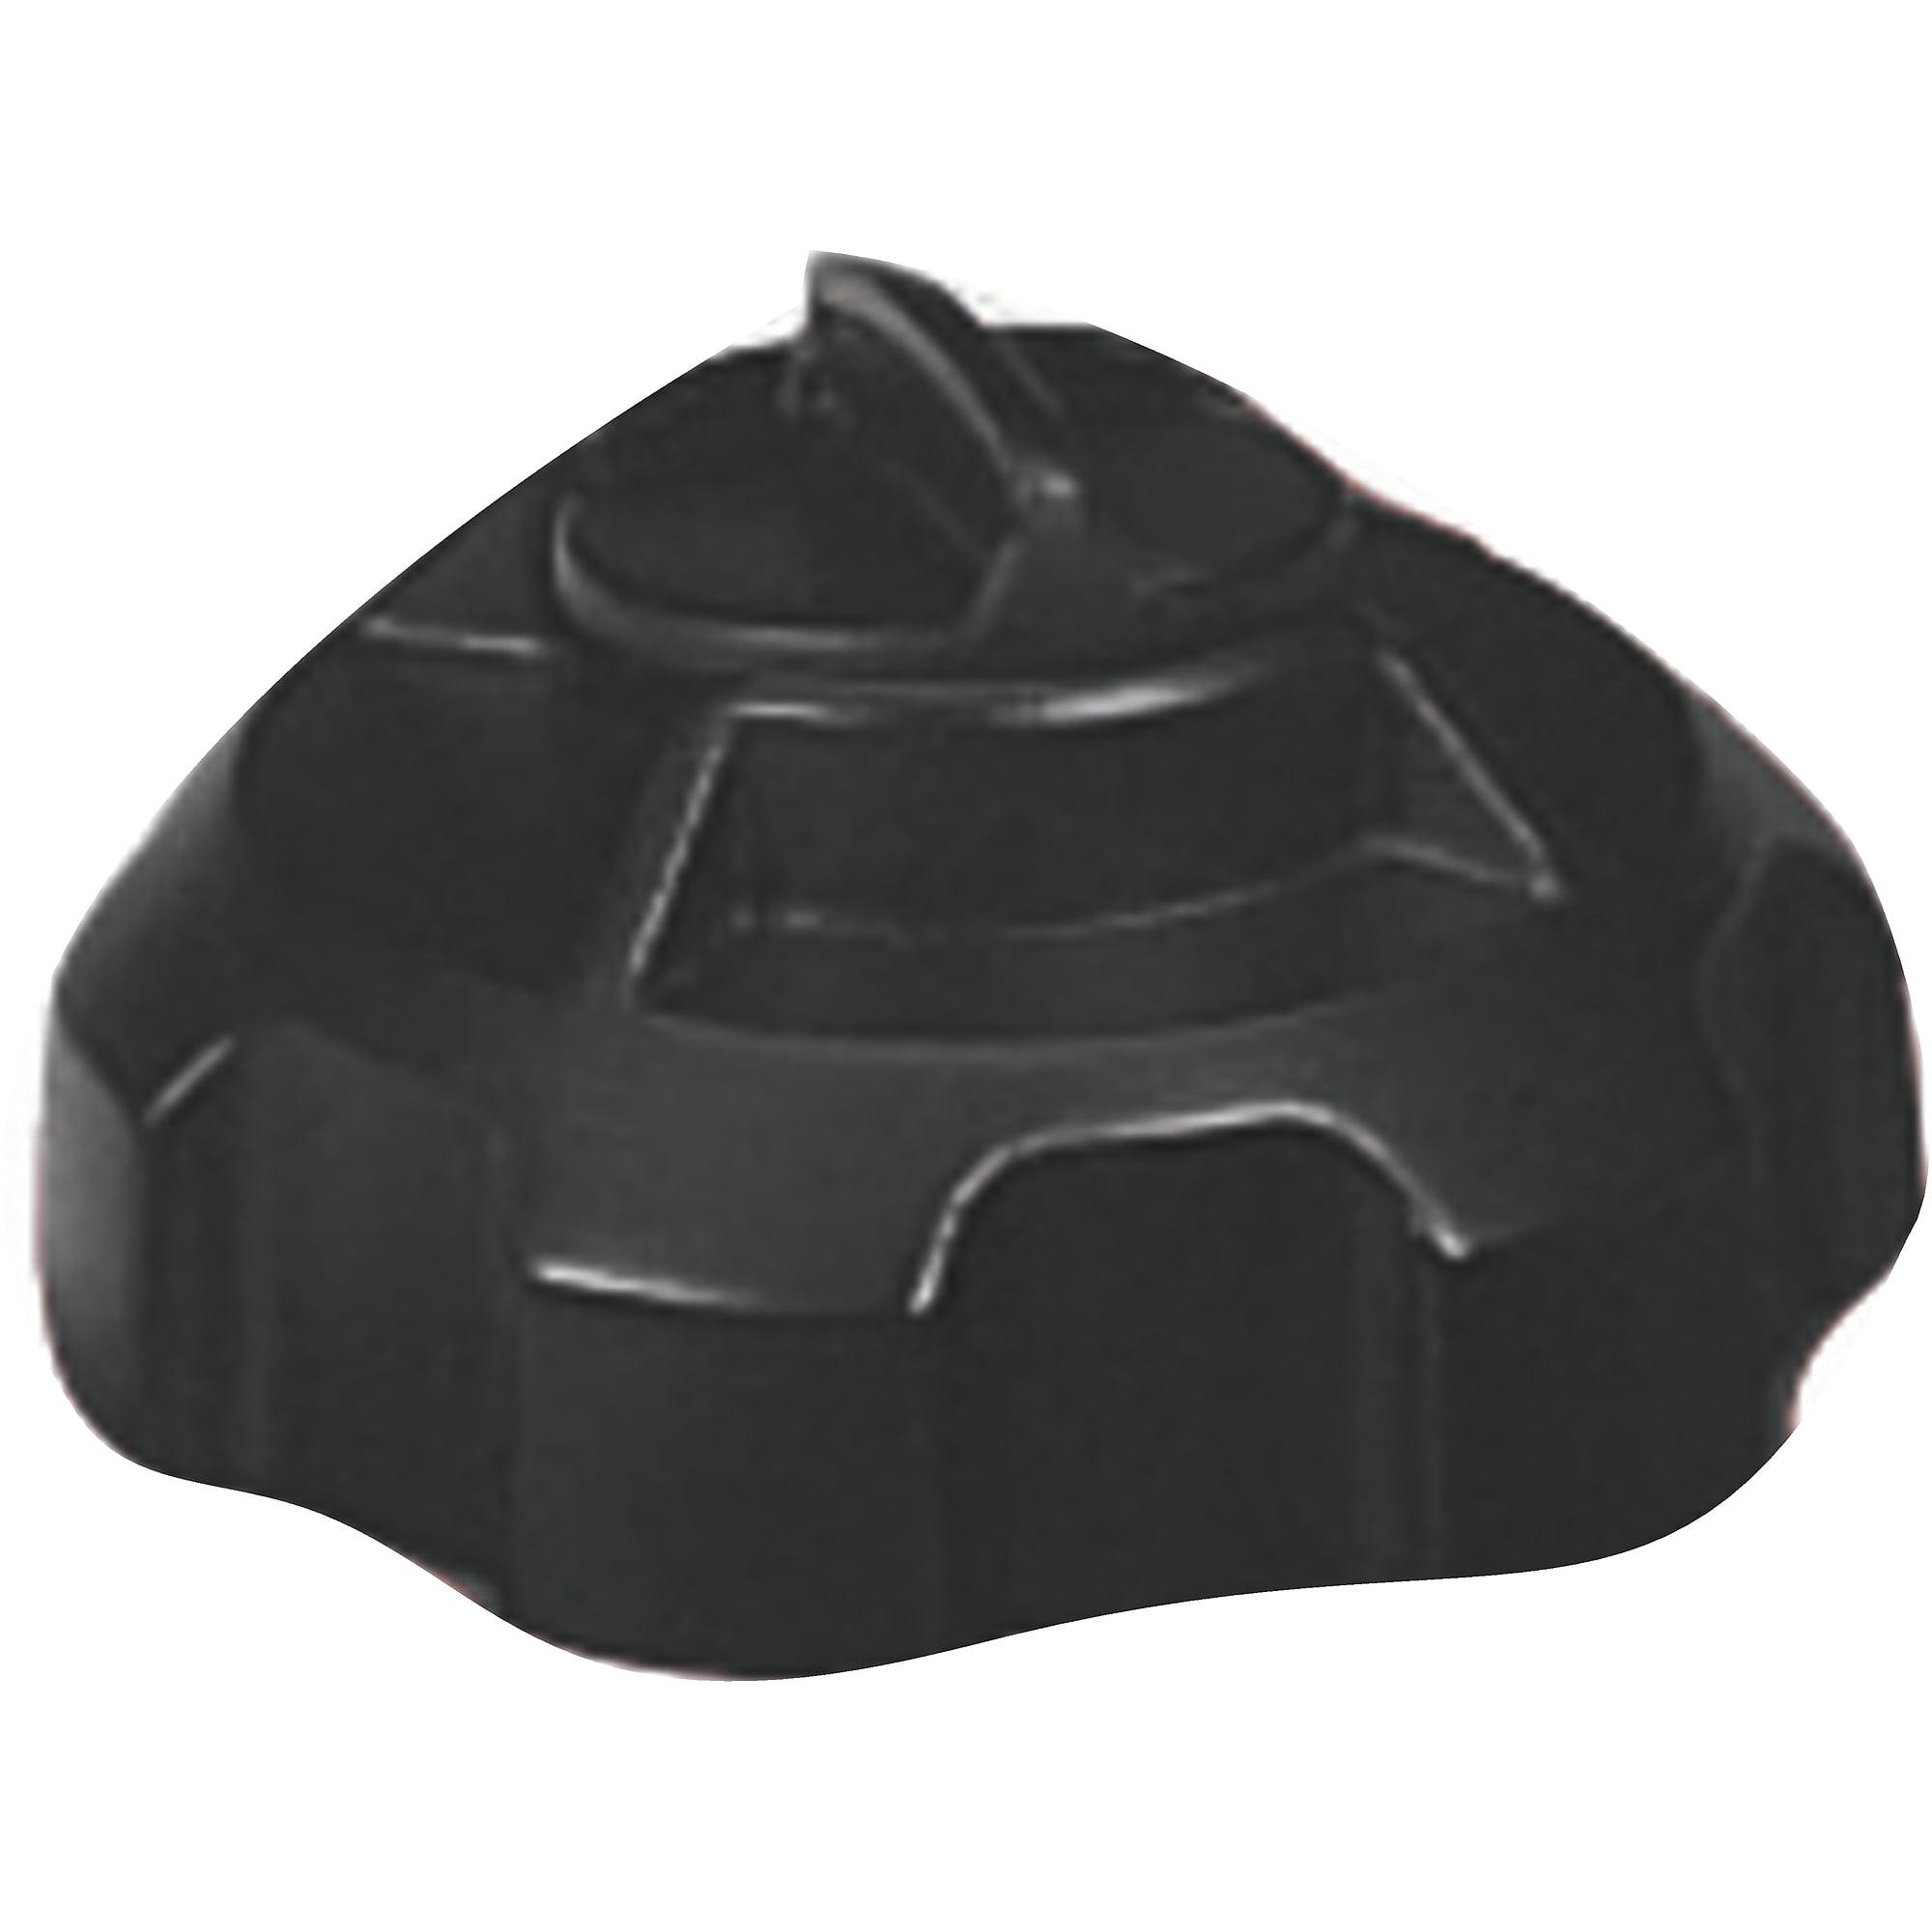 Moeller/Tempo Manual Vent Fuel Cap, Pre 2011